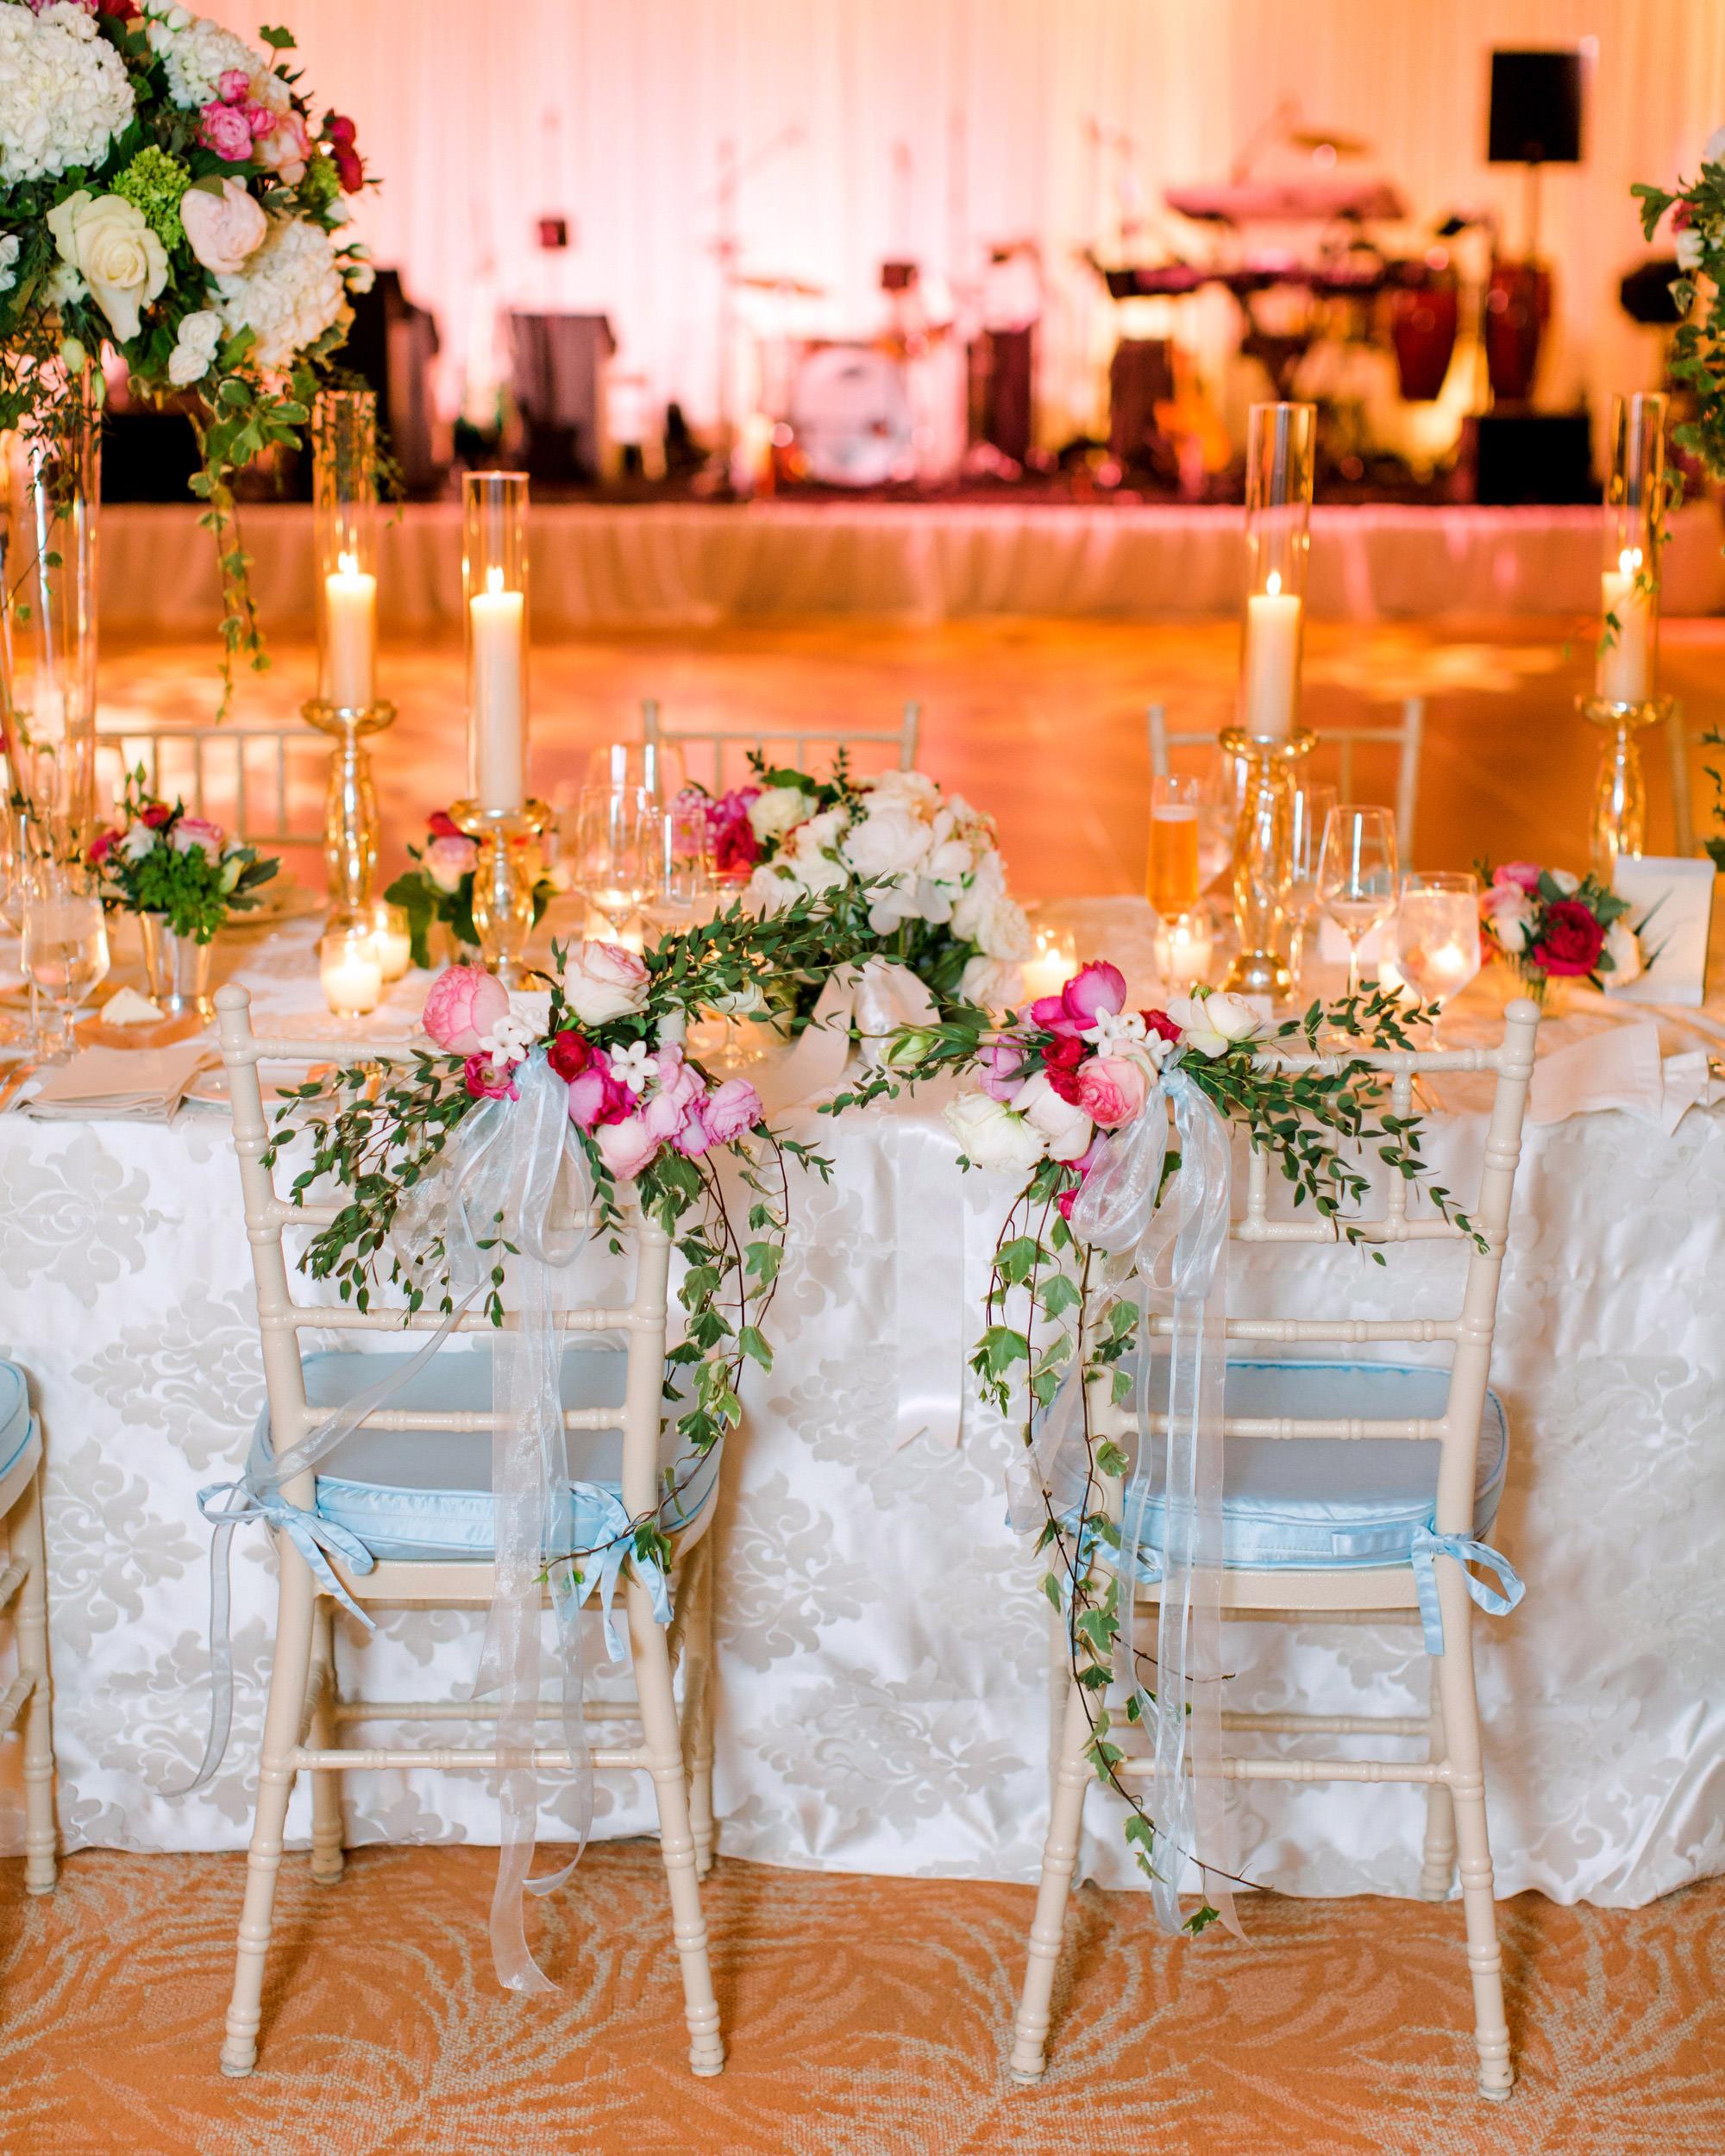 biltmore_santa_barbara_wedding_photos_coral_casino_052.jpg